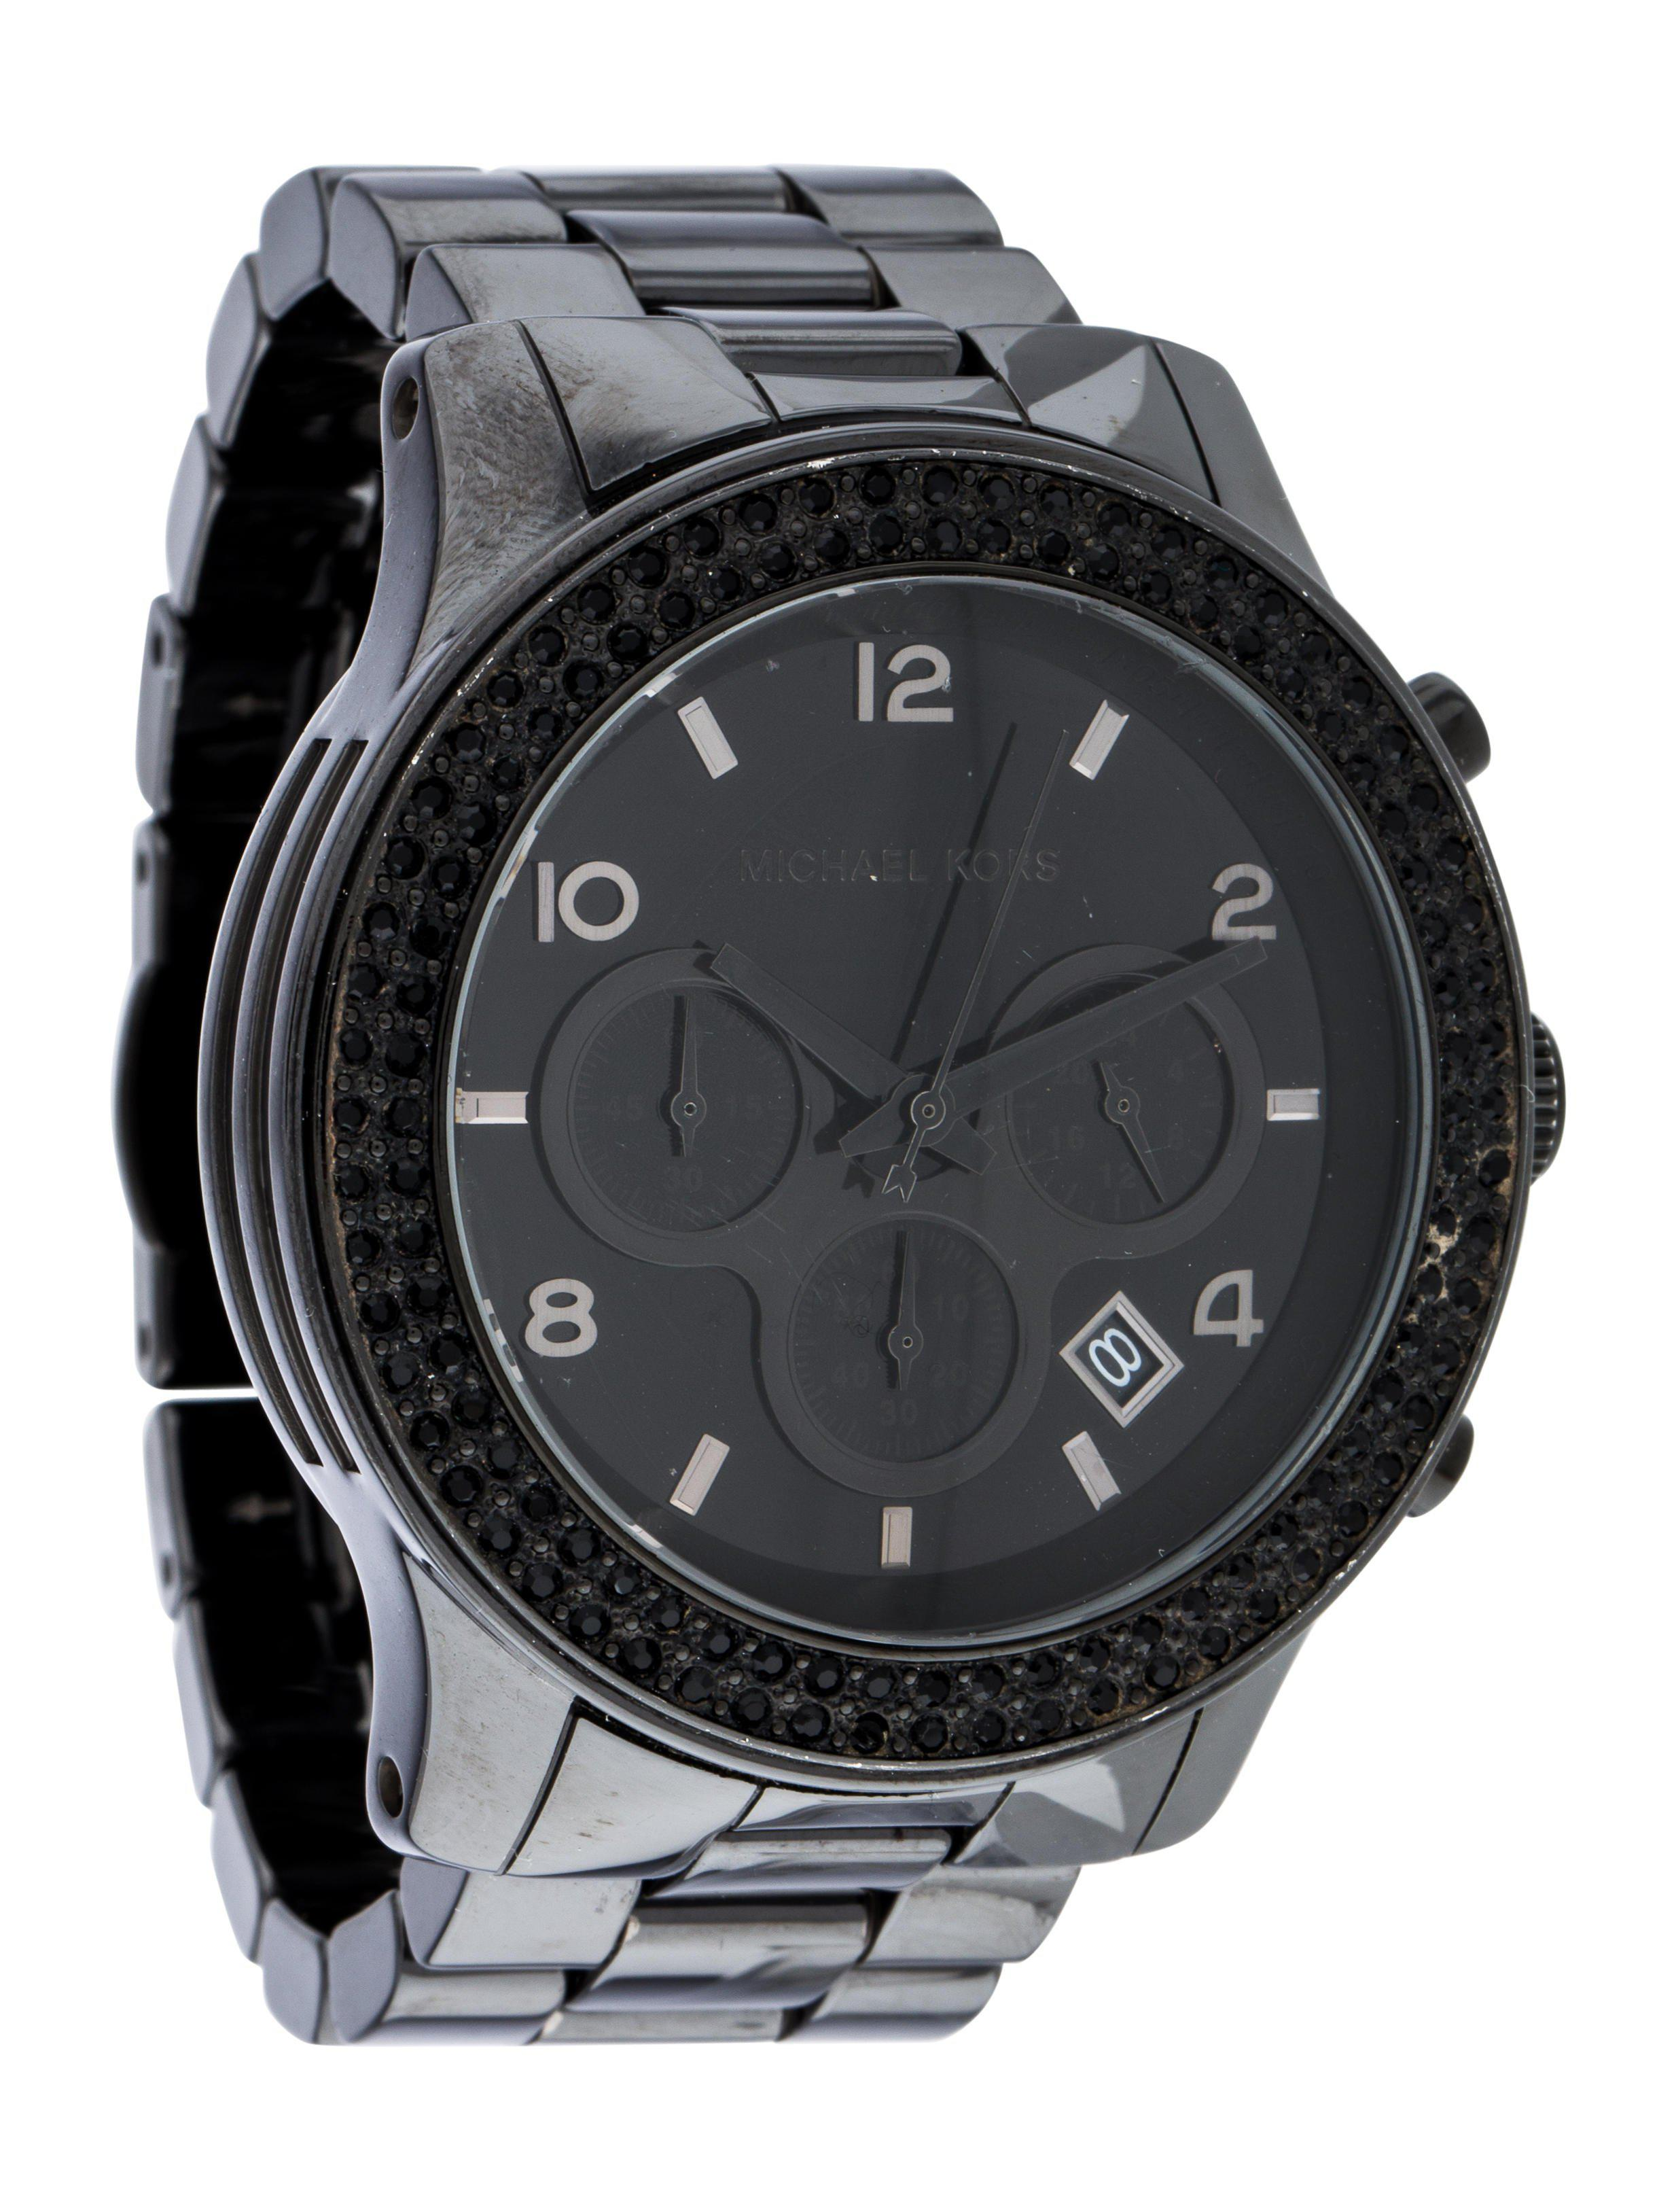 90679ba2b1e8 Lyst - Michael Kors Runway Blackout Watch Black in Metallic